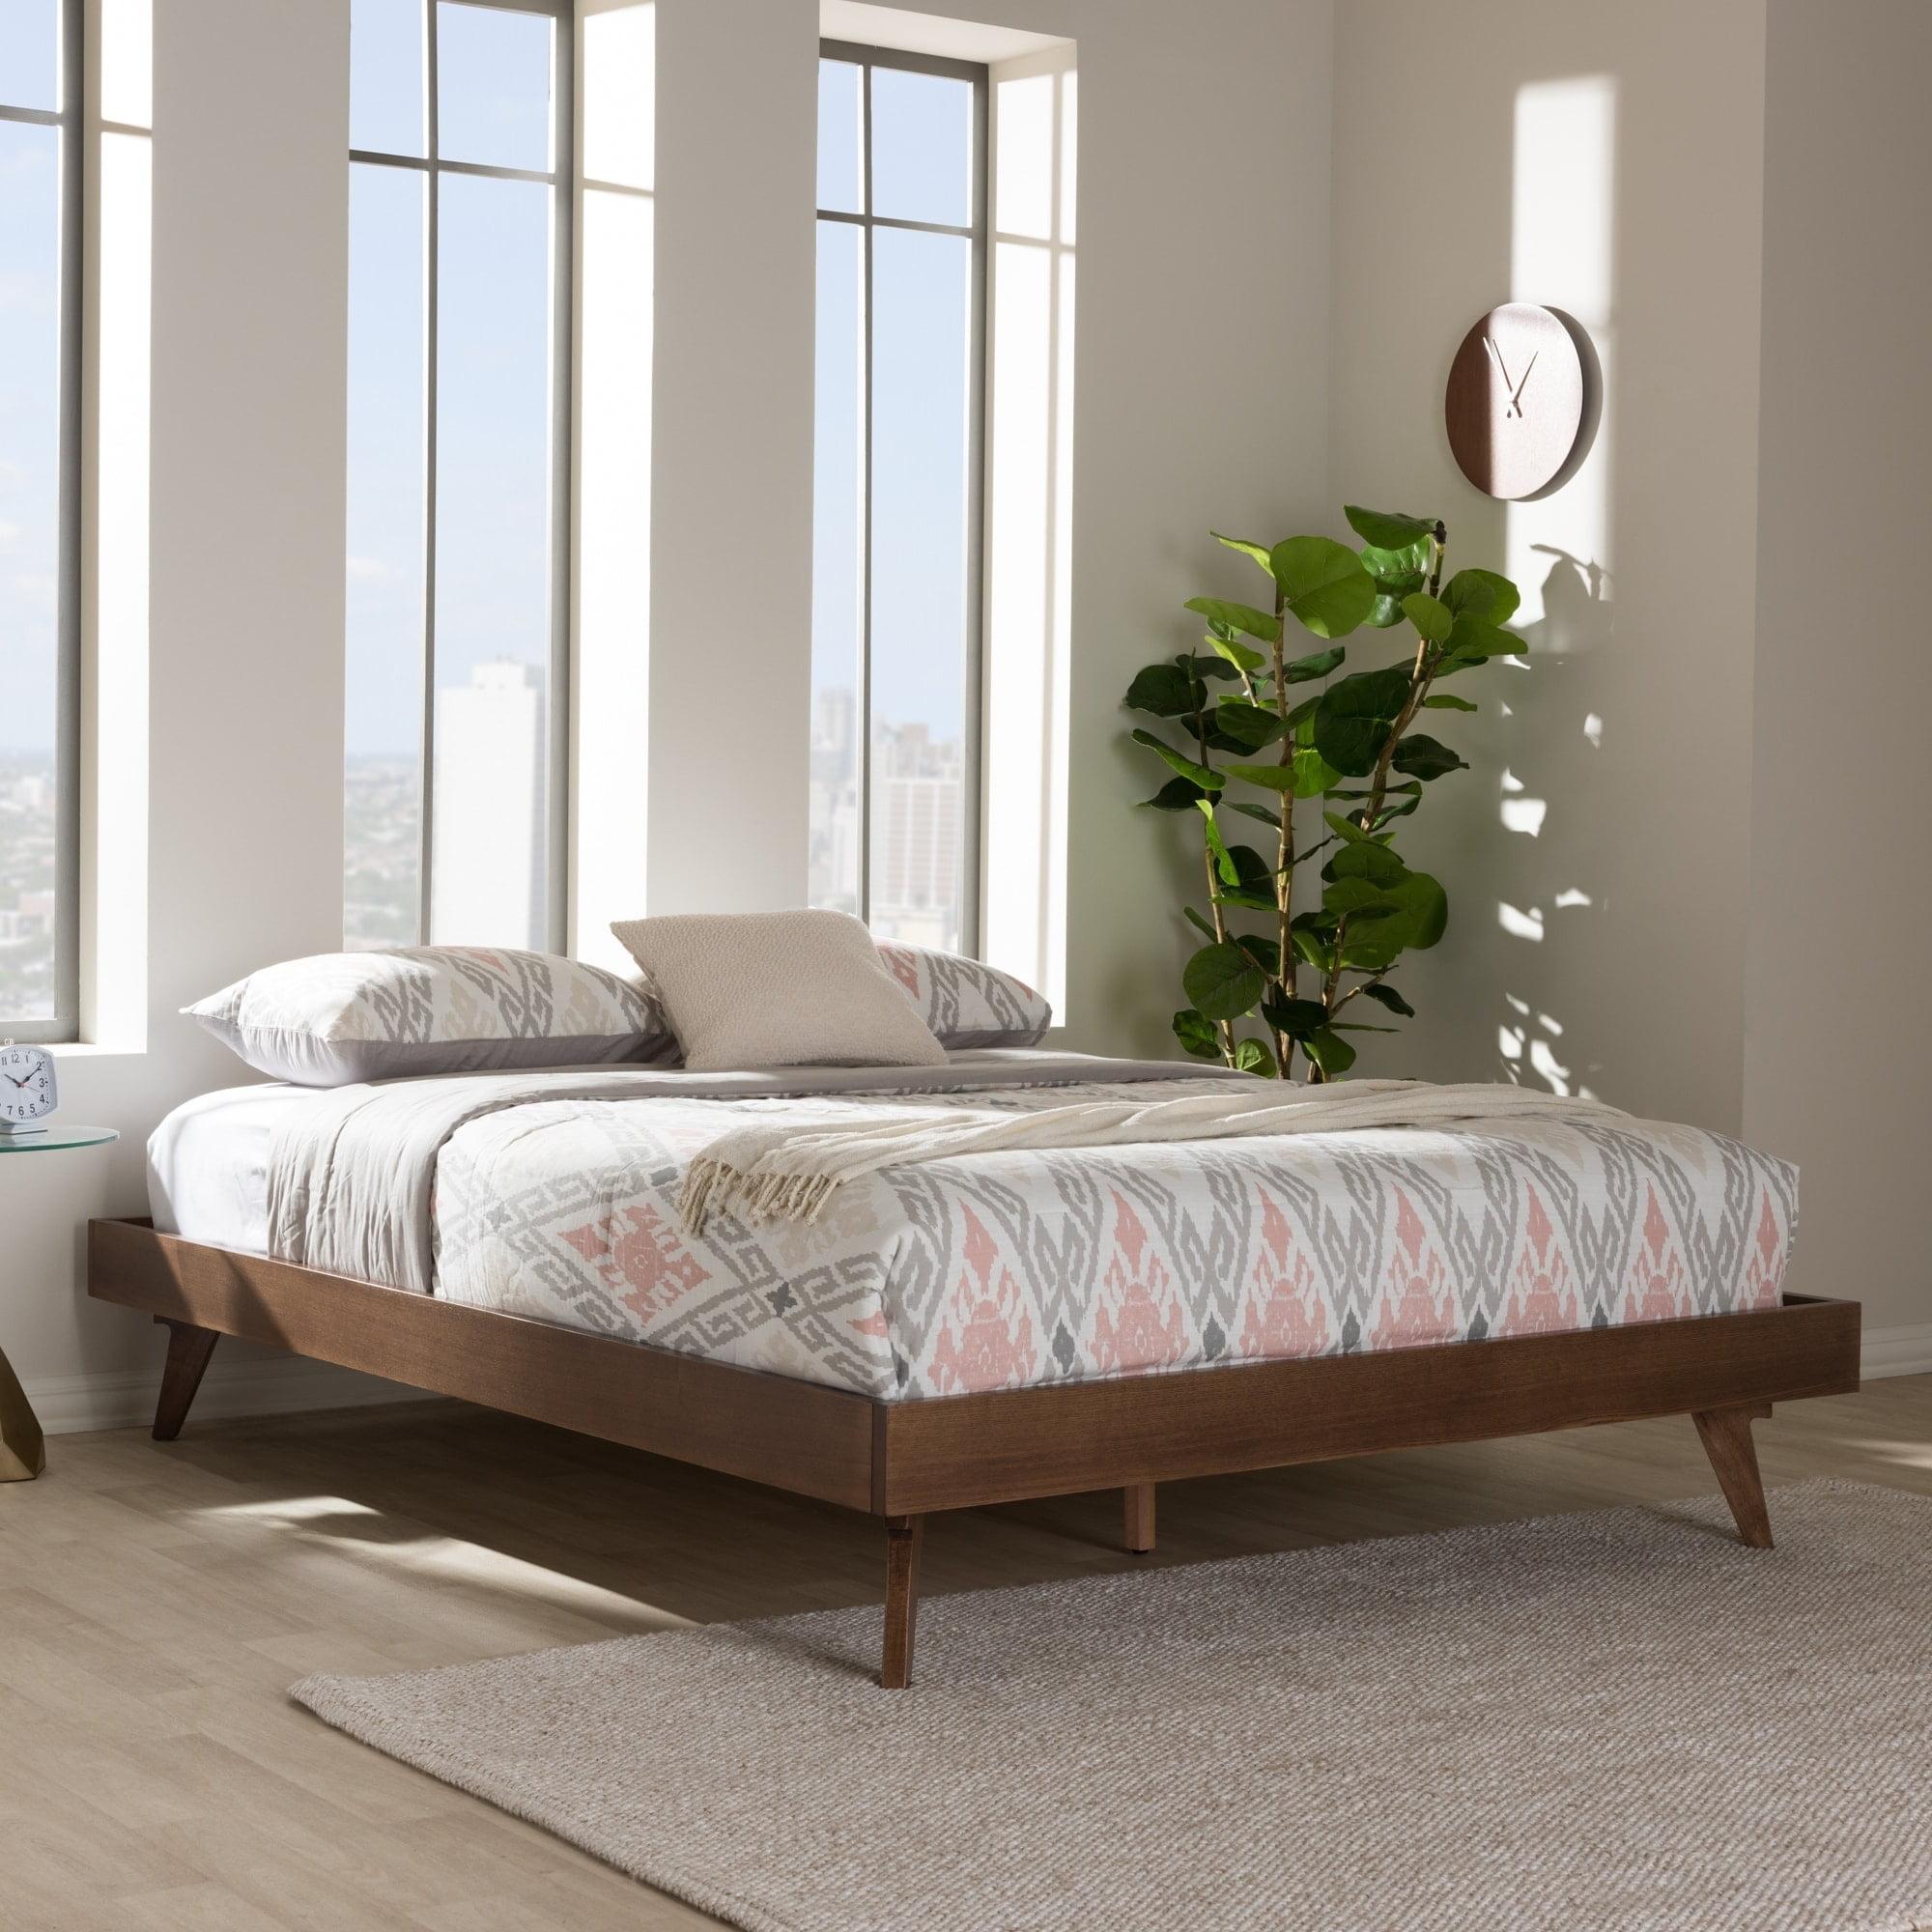 Baxton Studio Mid-Century Walnut Brown Wood Bed Frame by